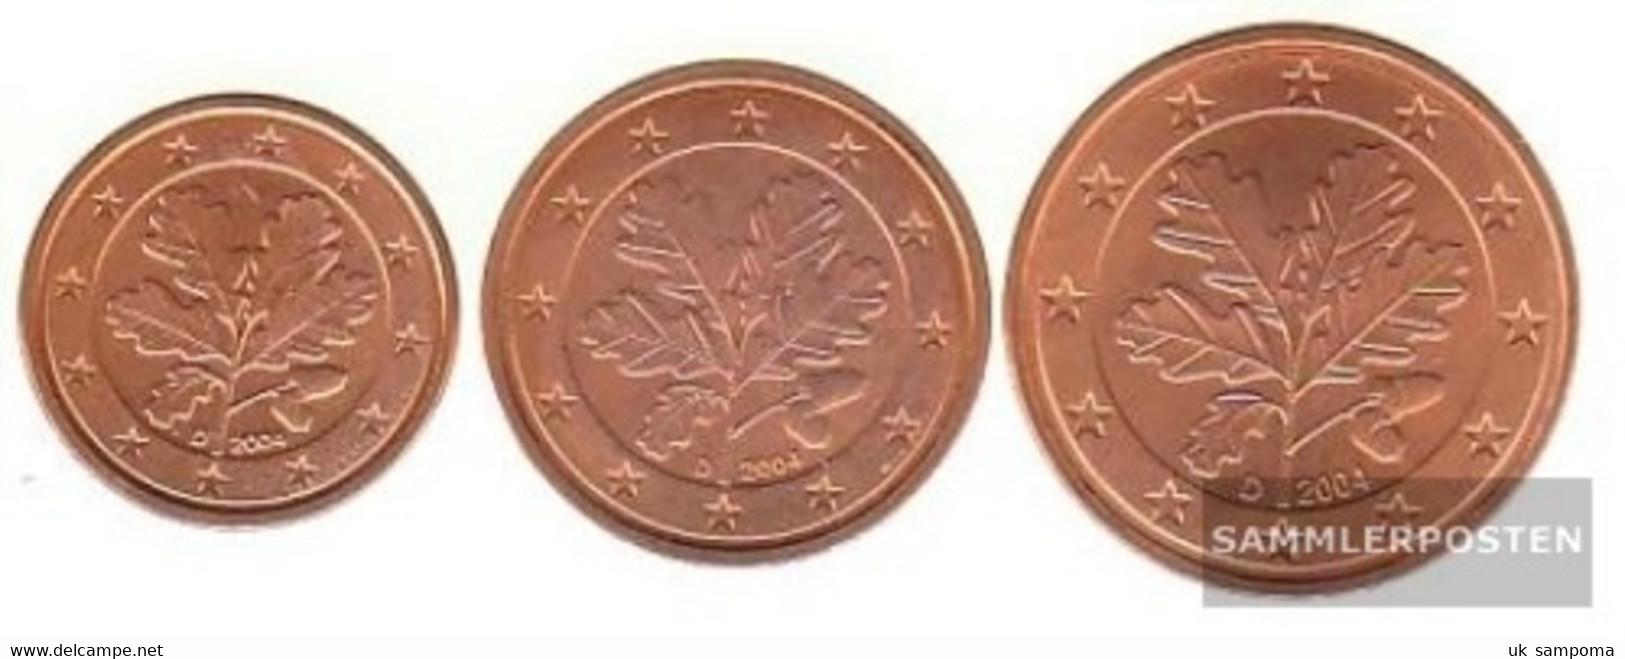 FRD (FR.Germany) D1 - 3 2004 D Stgl./unzirkuliert Stgl./unzirkuliert 2004 Kursmünze 1, 2 And 5 Cent - Germany